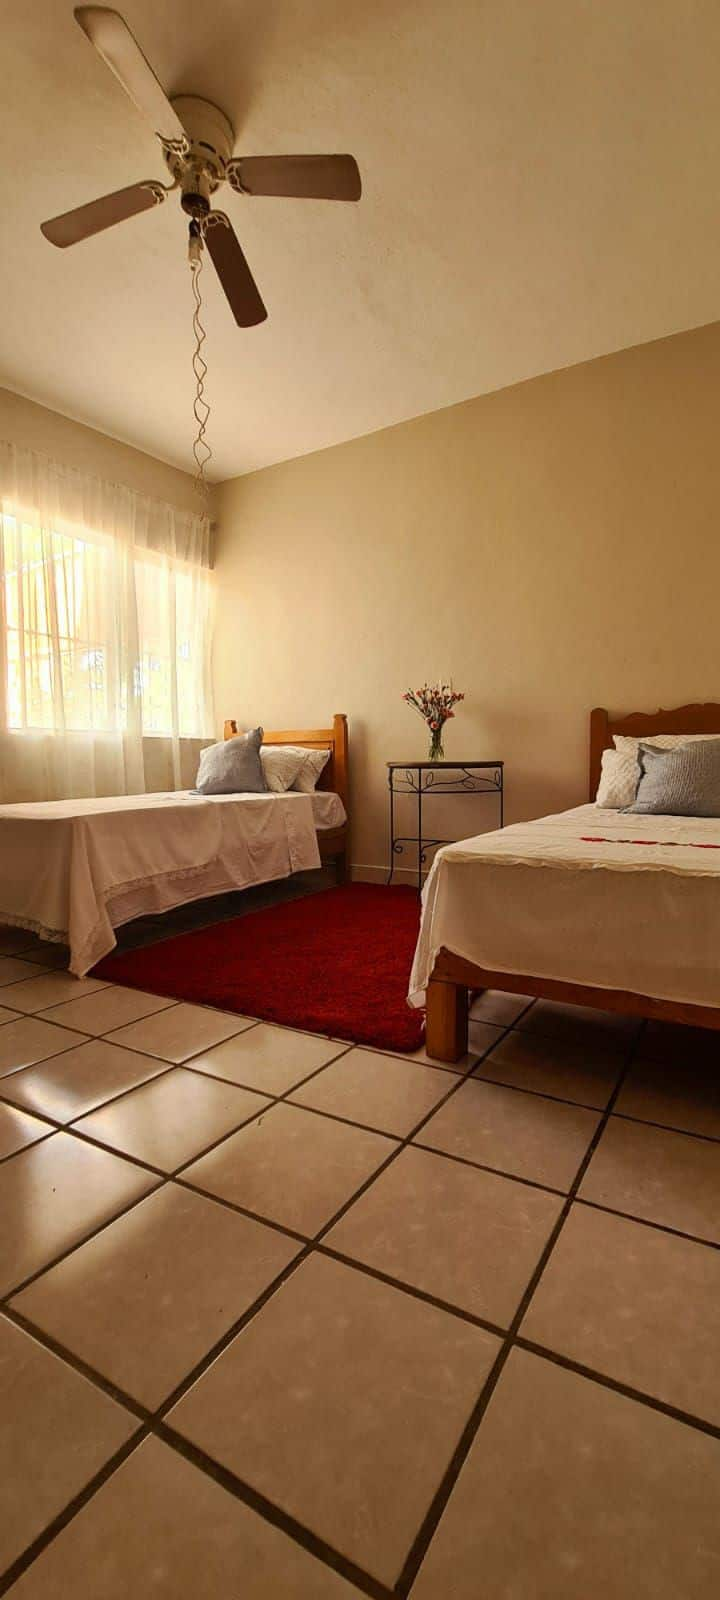 Cozy room, residencial area near the beach&airport